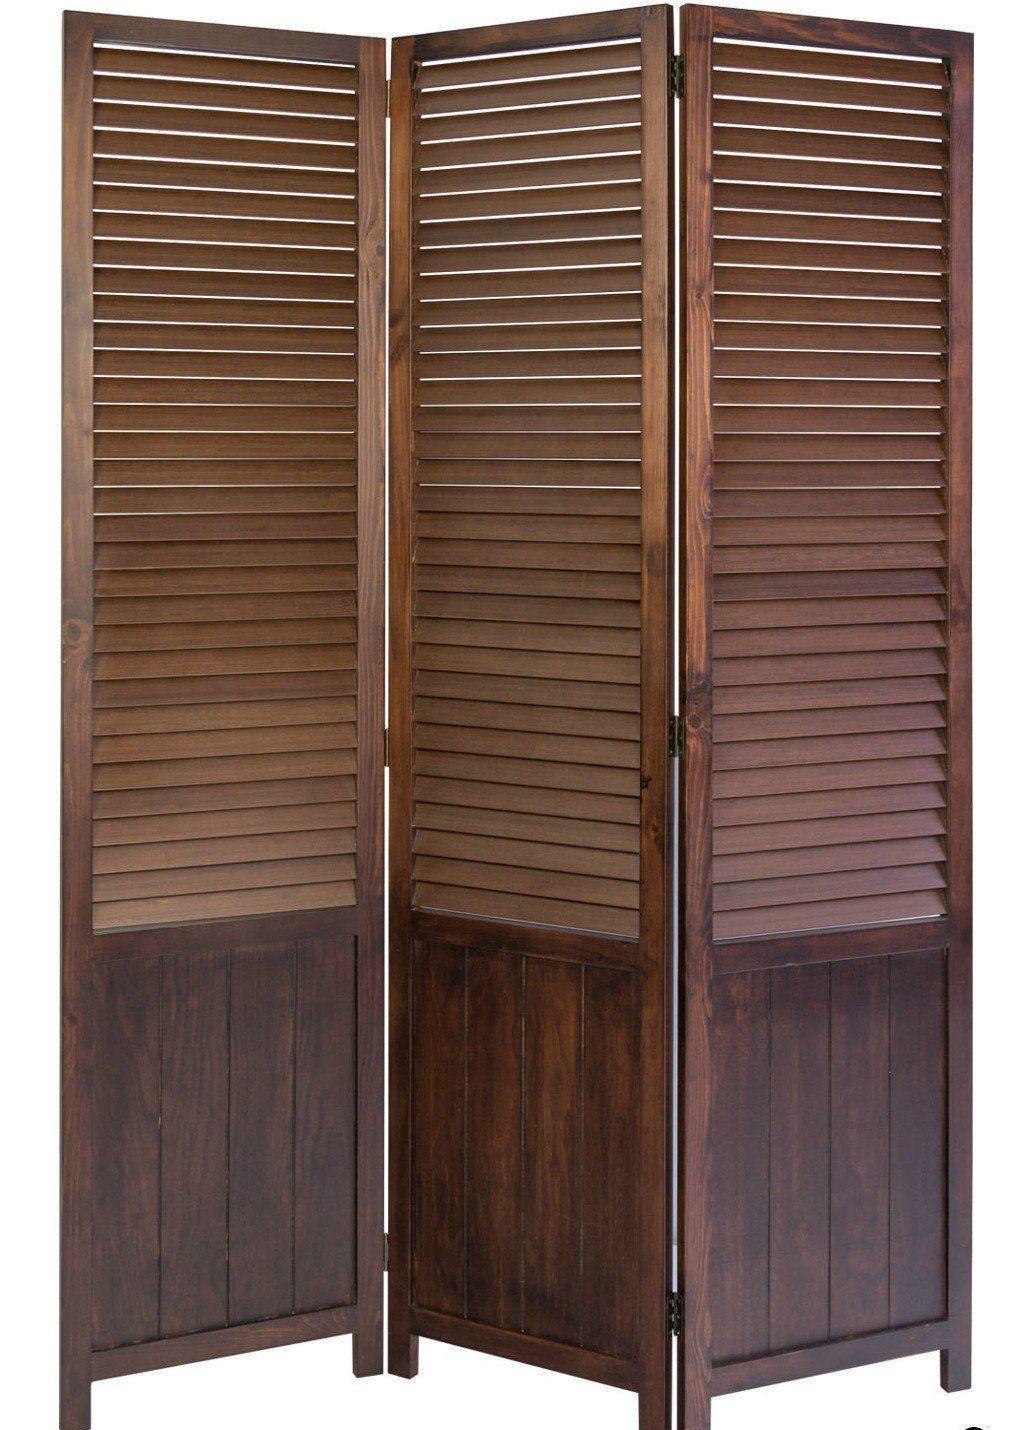 paravent wooden slat room divider screen brown 3 panel rh pinterest com